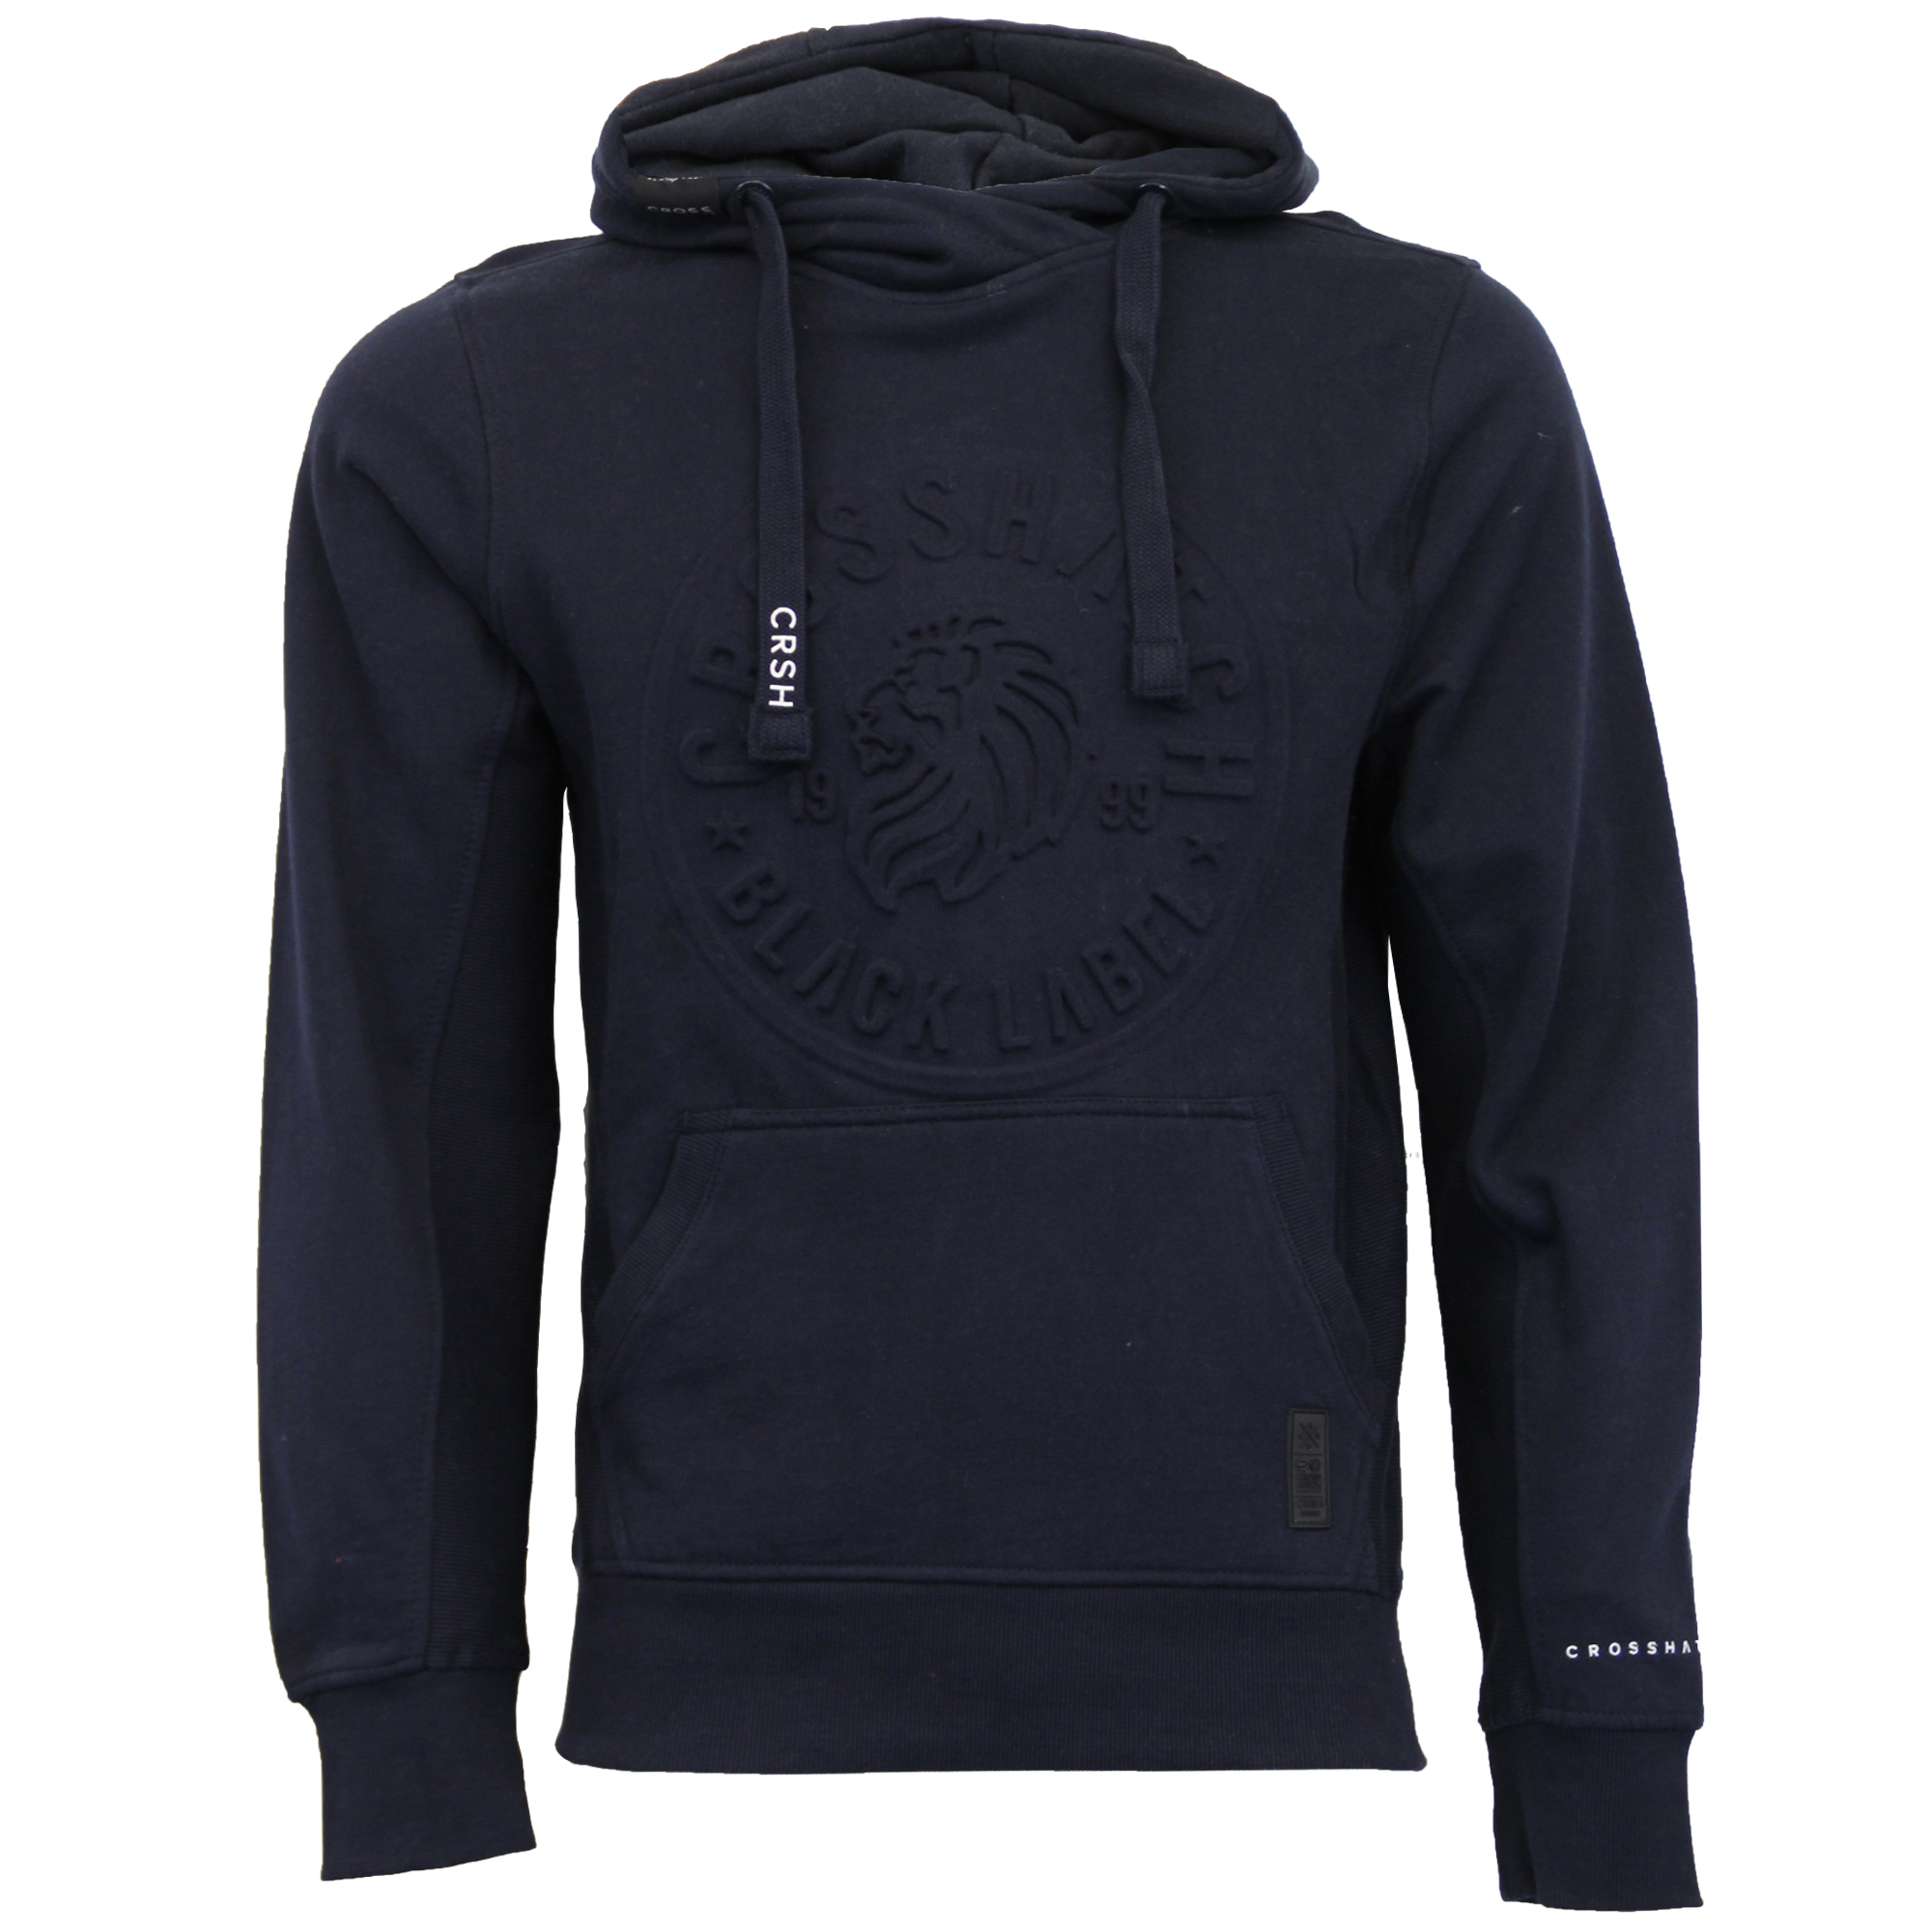 Mens-Sweatshirt-Crosshatch-Hoodie-Top-Embossed-Logo-Print-Sweat-Fleece-Lined-New thumbnail 15